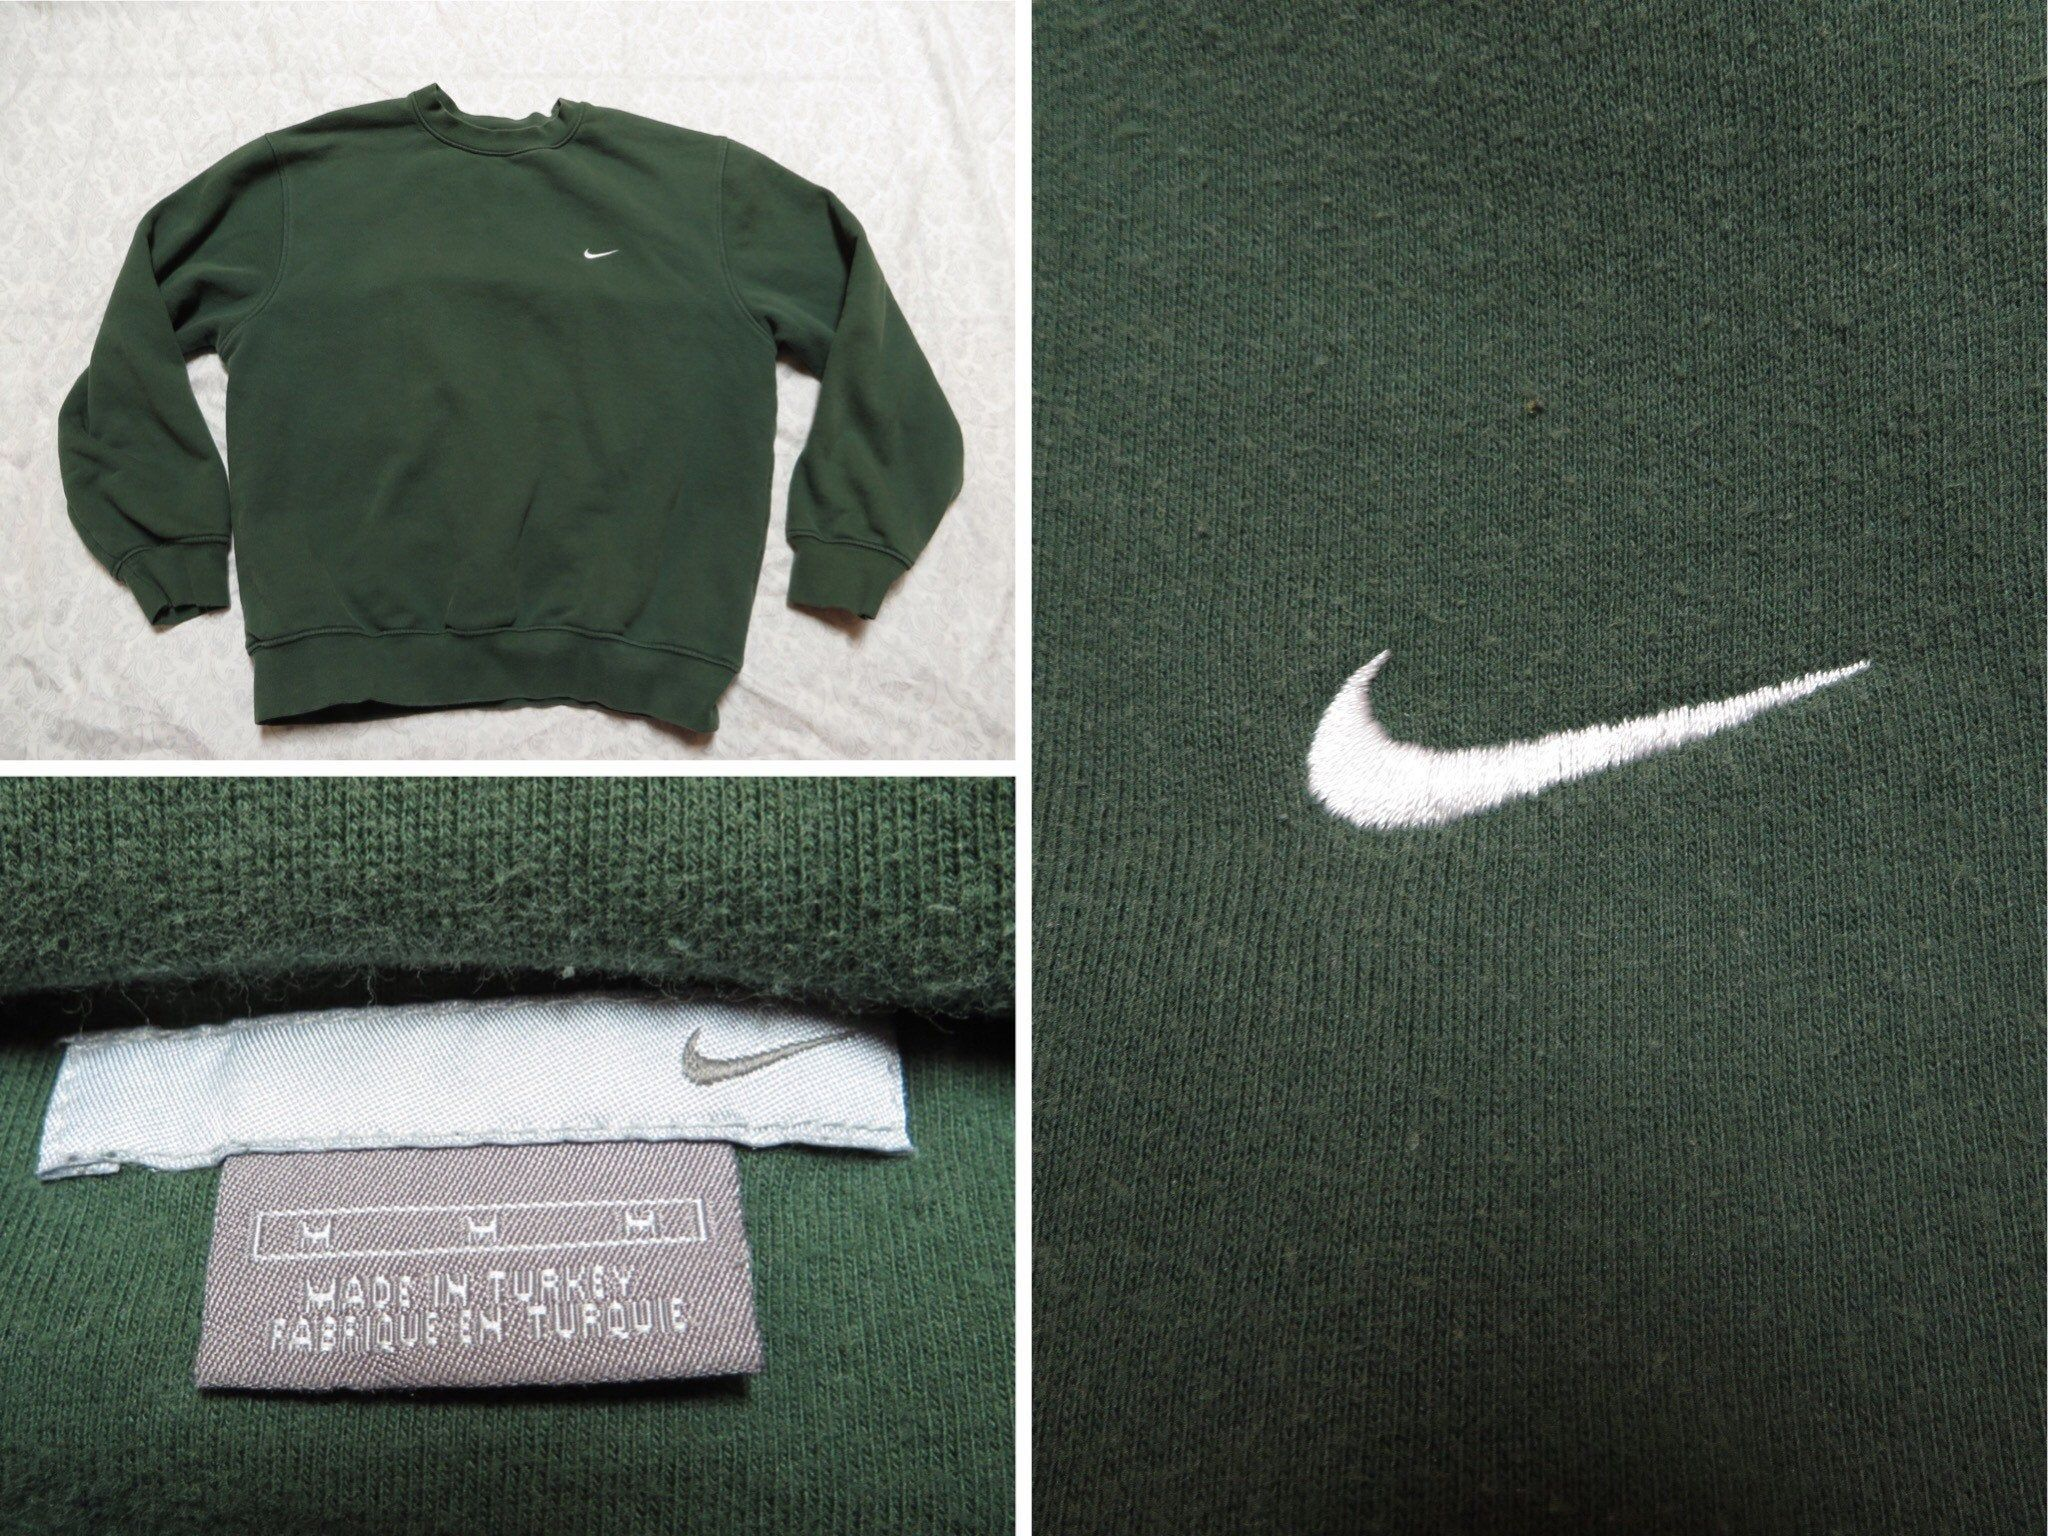 Vintage Nike Sweatshirt Green Crewneck White Embroidered Swoosh Logo 2000 S Men S Oversized Medium By Gentl Vintage Nike Sweatshirt Green Crewneck Vintage Nike [ 1536 x 2048 Pixel ]